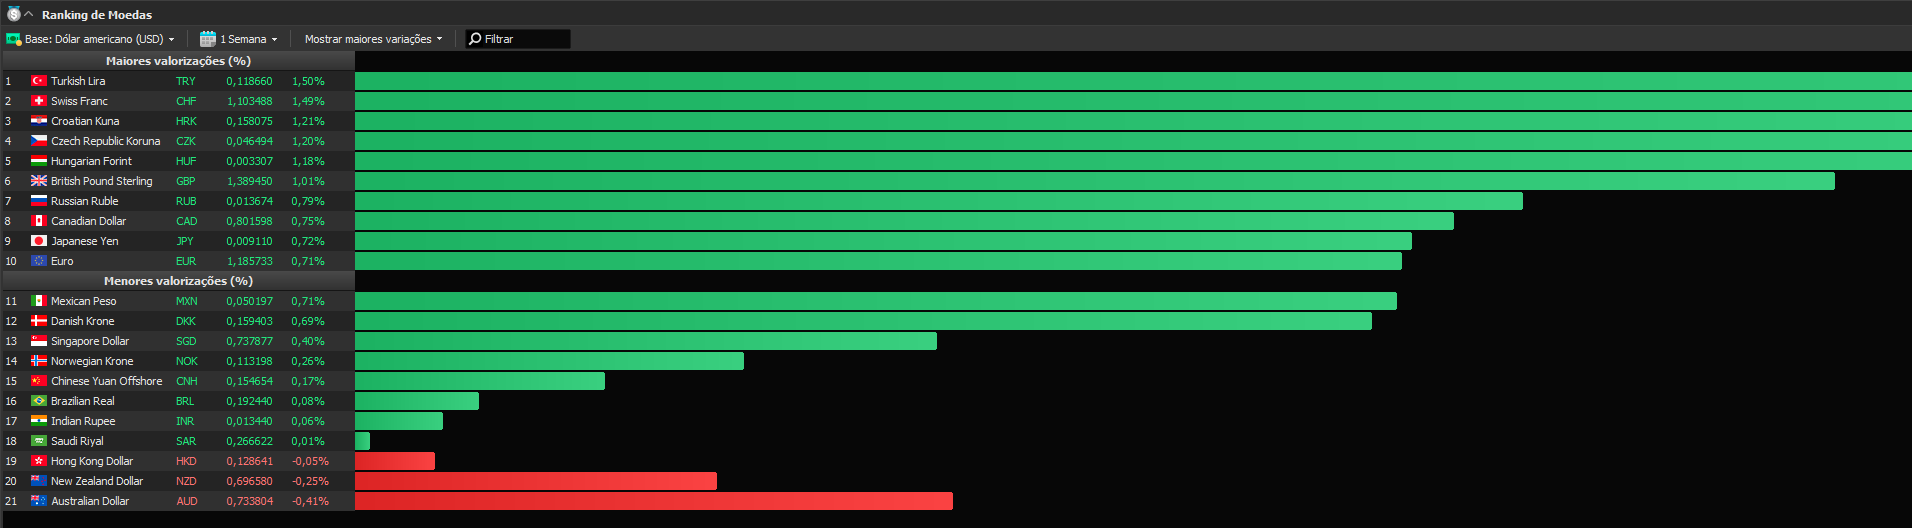 Ranking de MOedas 3007